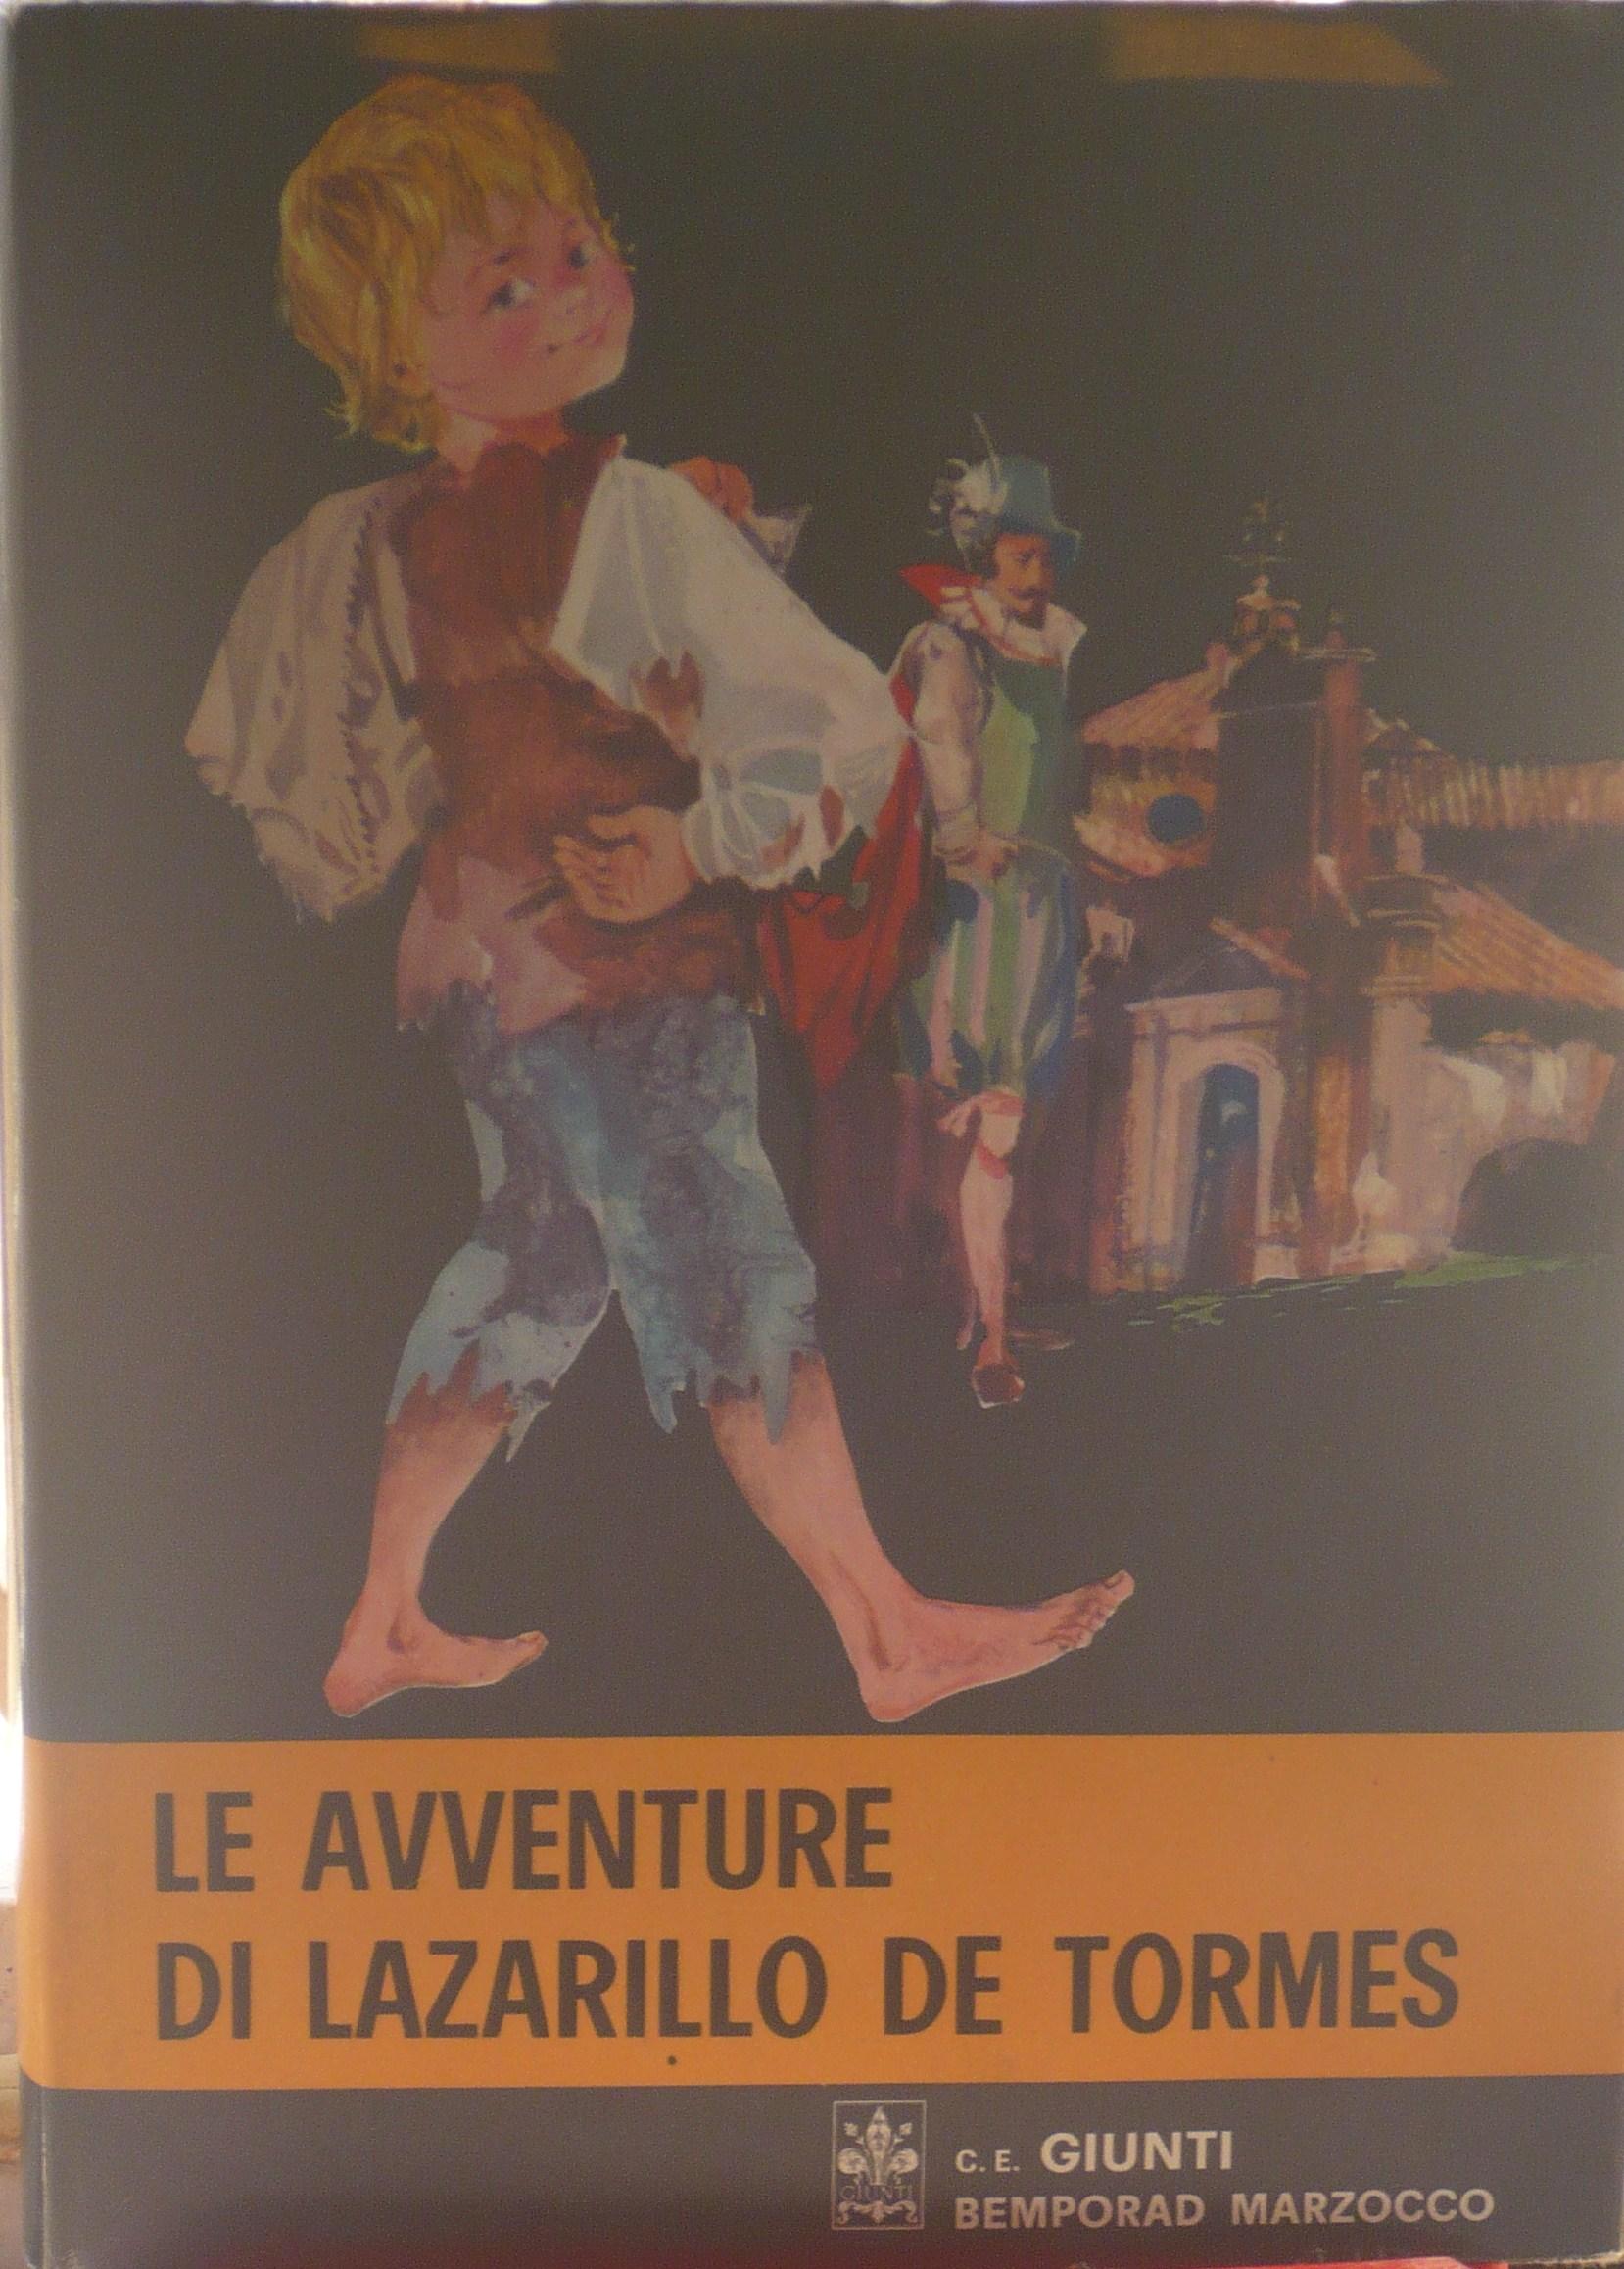 Le avventure di Lazarillo De Tormes